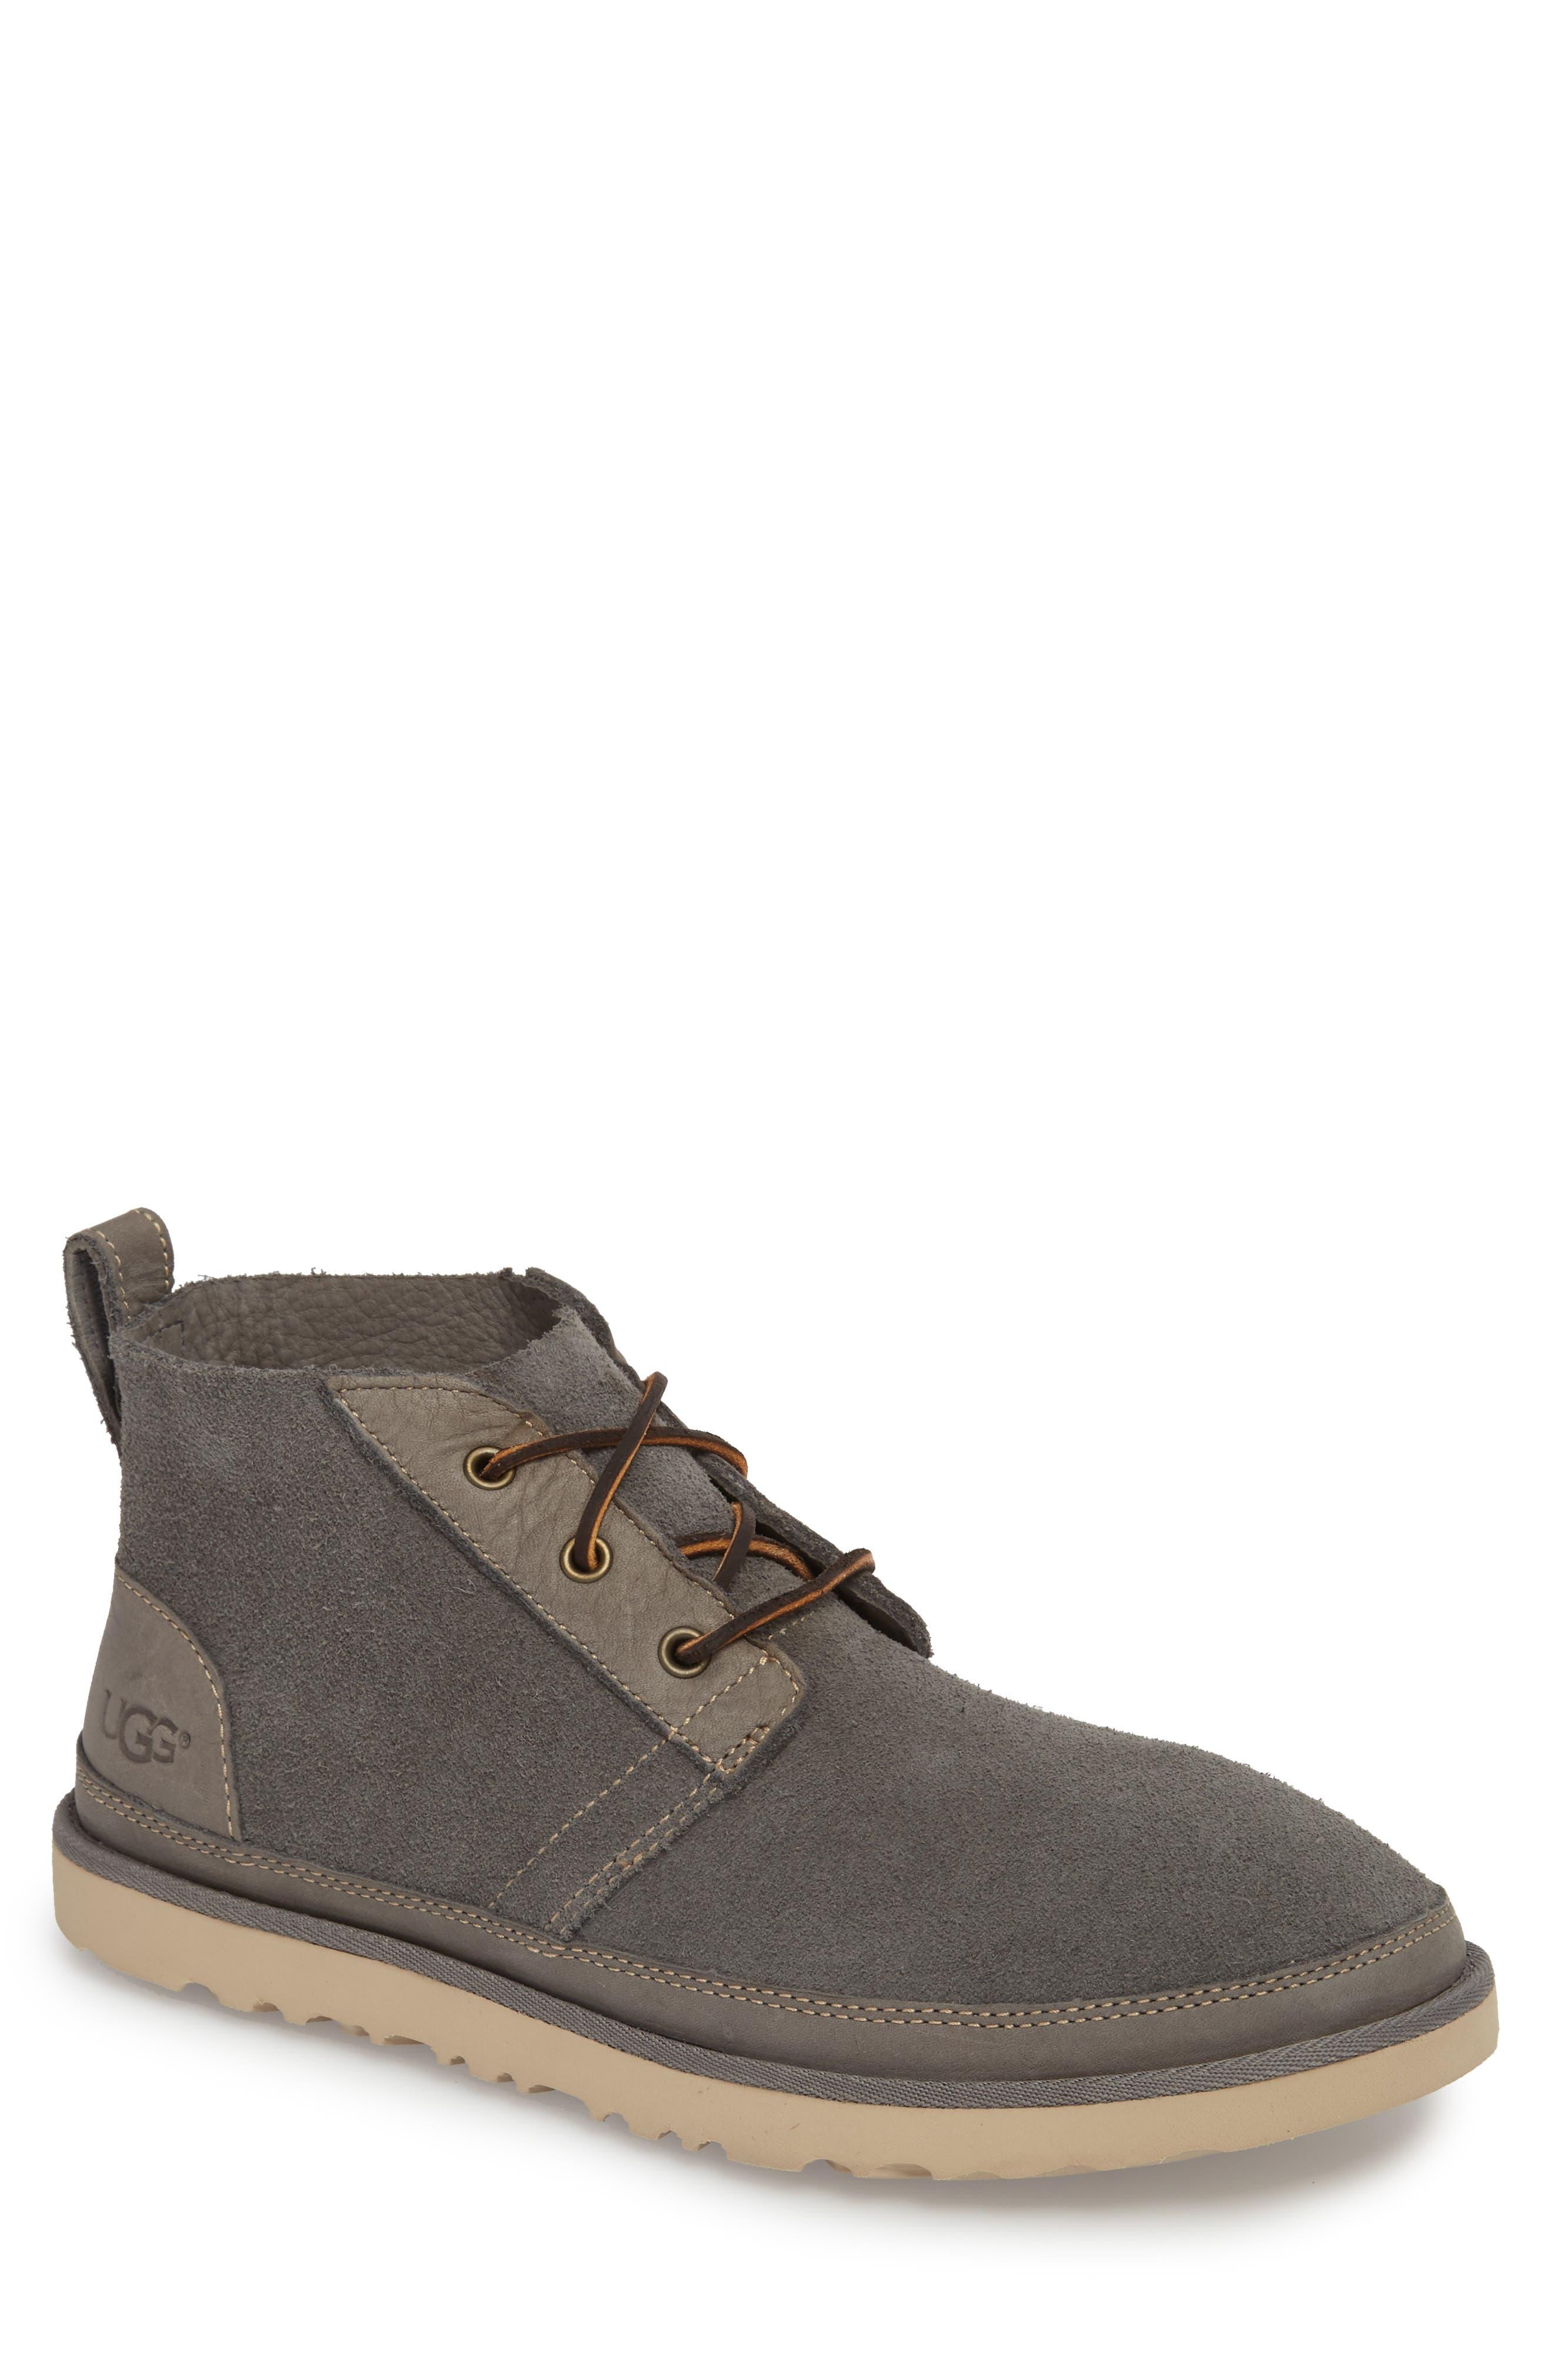 Ugg Neumel Unlined Chukka Boot, Grey